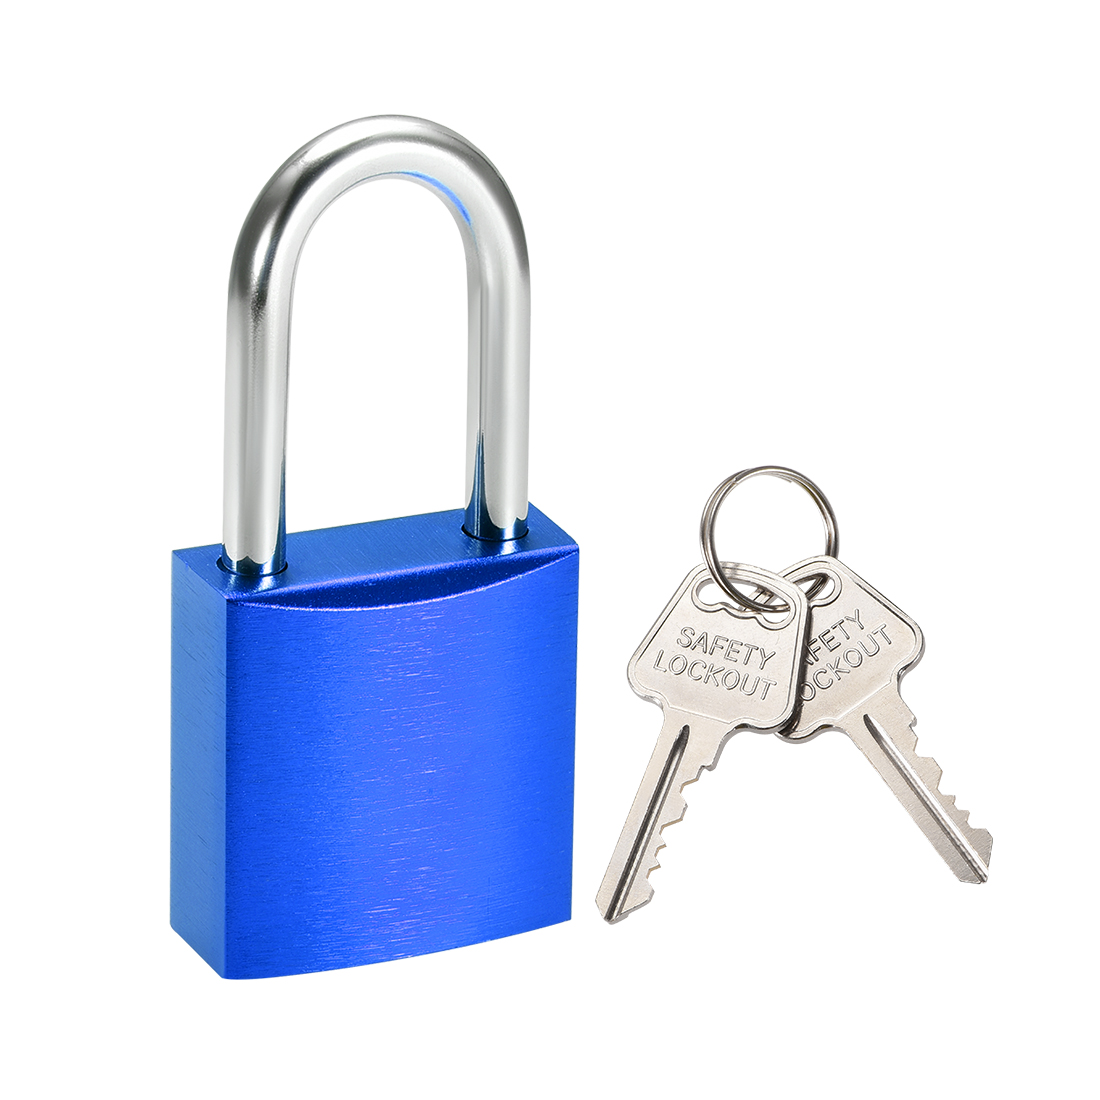 Lock 1-1/2 Inch Shackle Key Alike Safety Padlock Blue